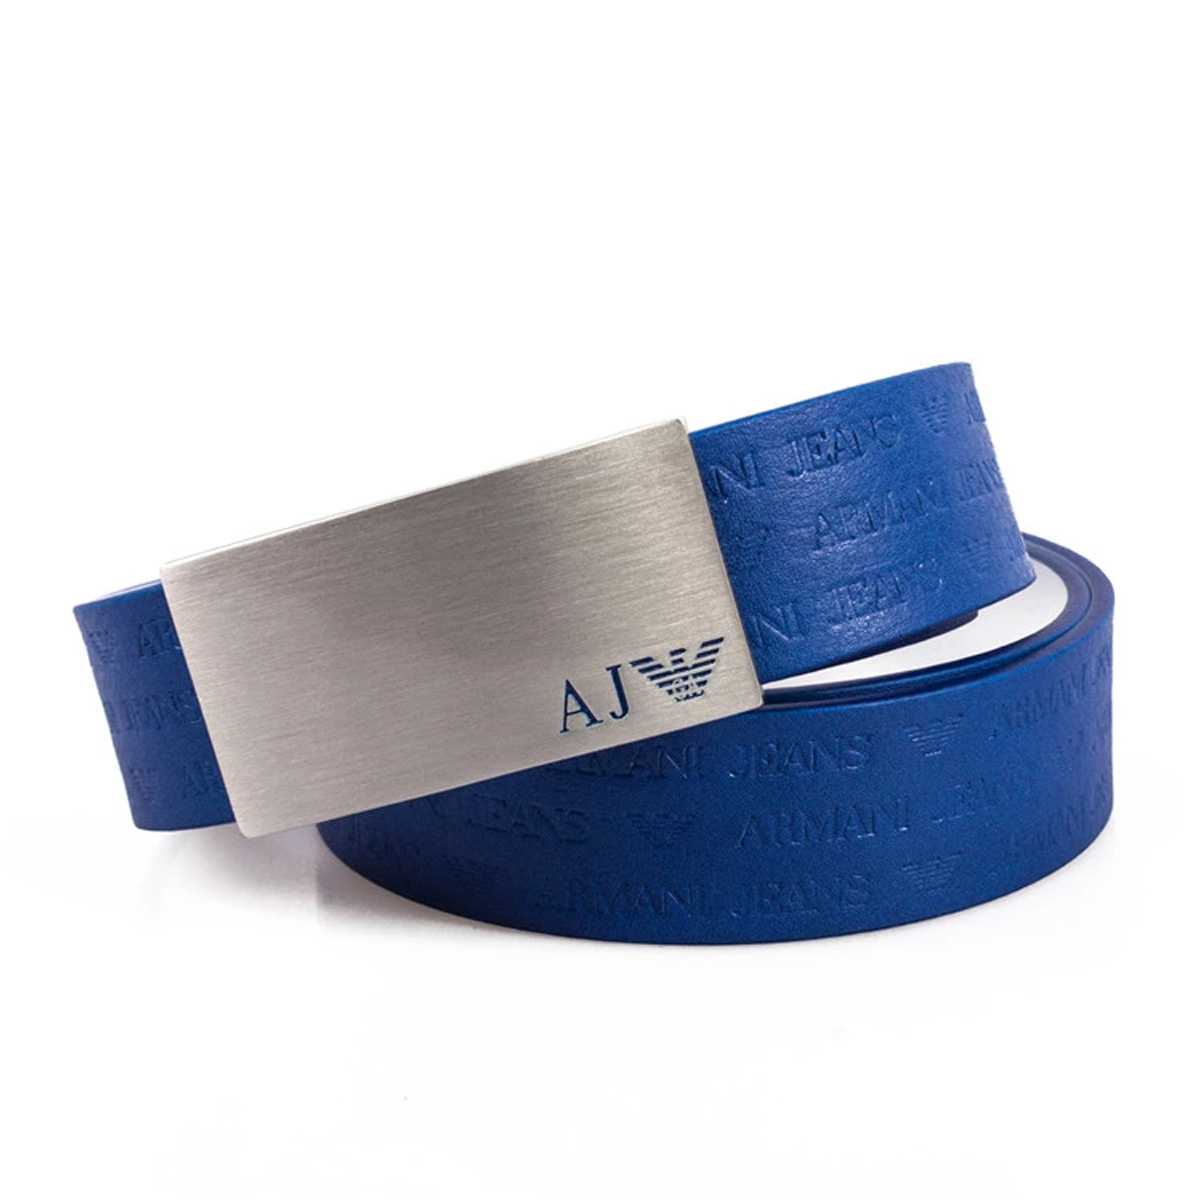 armani jeans ремень armani jeans 06115 r3 g8 Ремень Armani 90410 JEANS